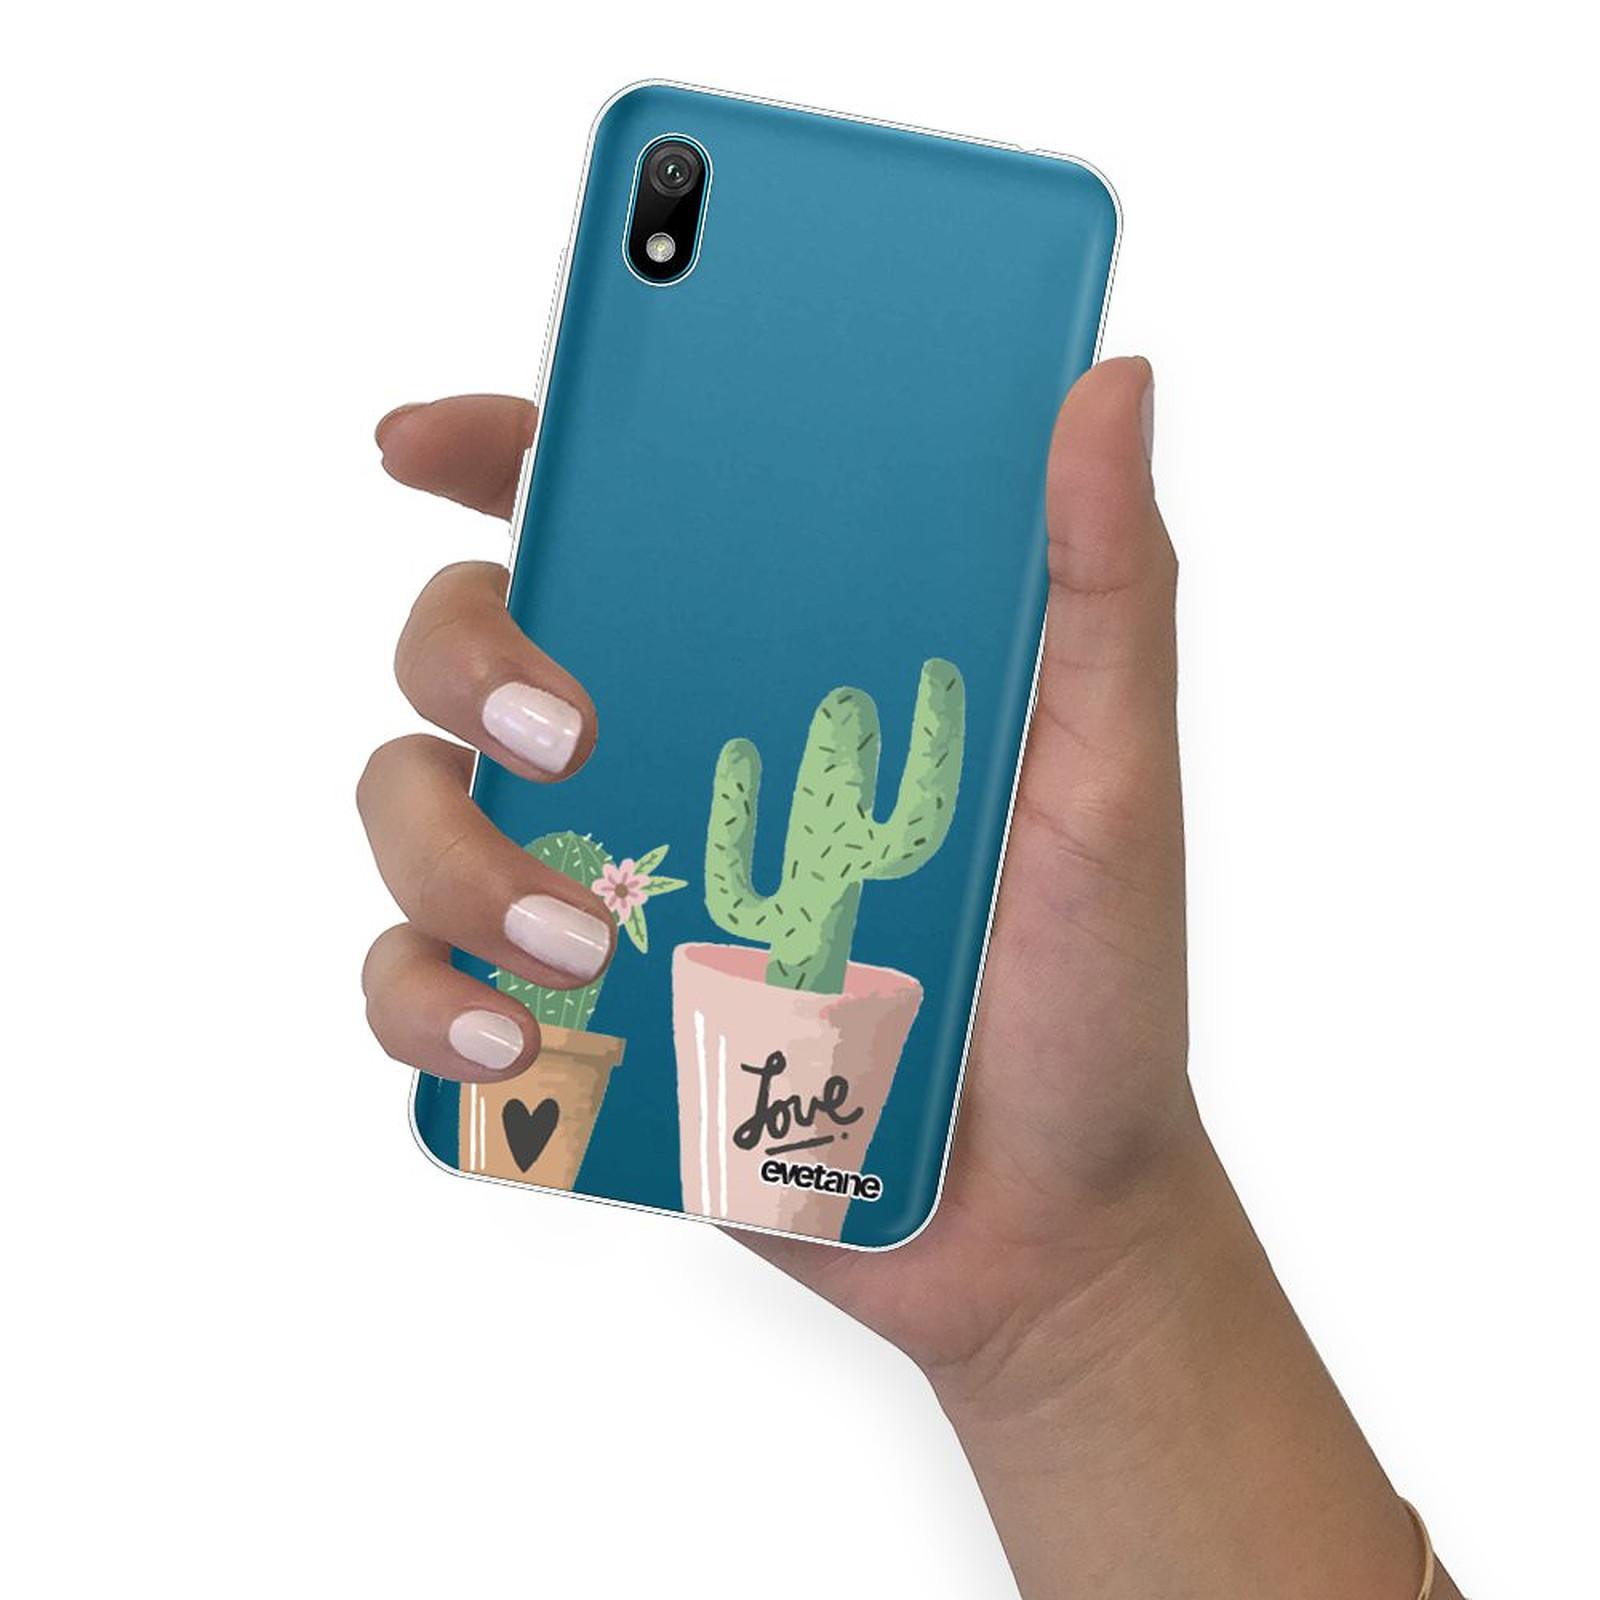 EVETANE Coque Huawei Y5 2019 360 intégrale transparente Cactus Love Tendance